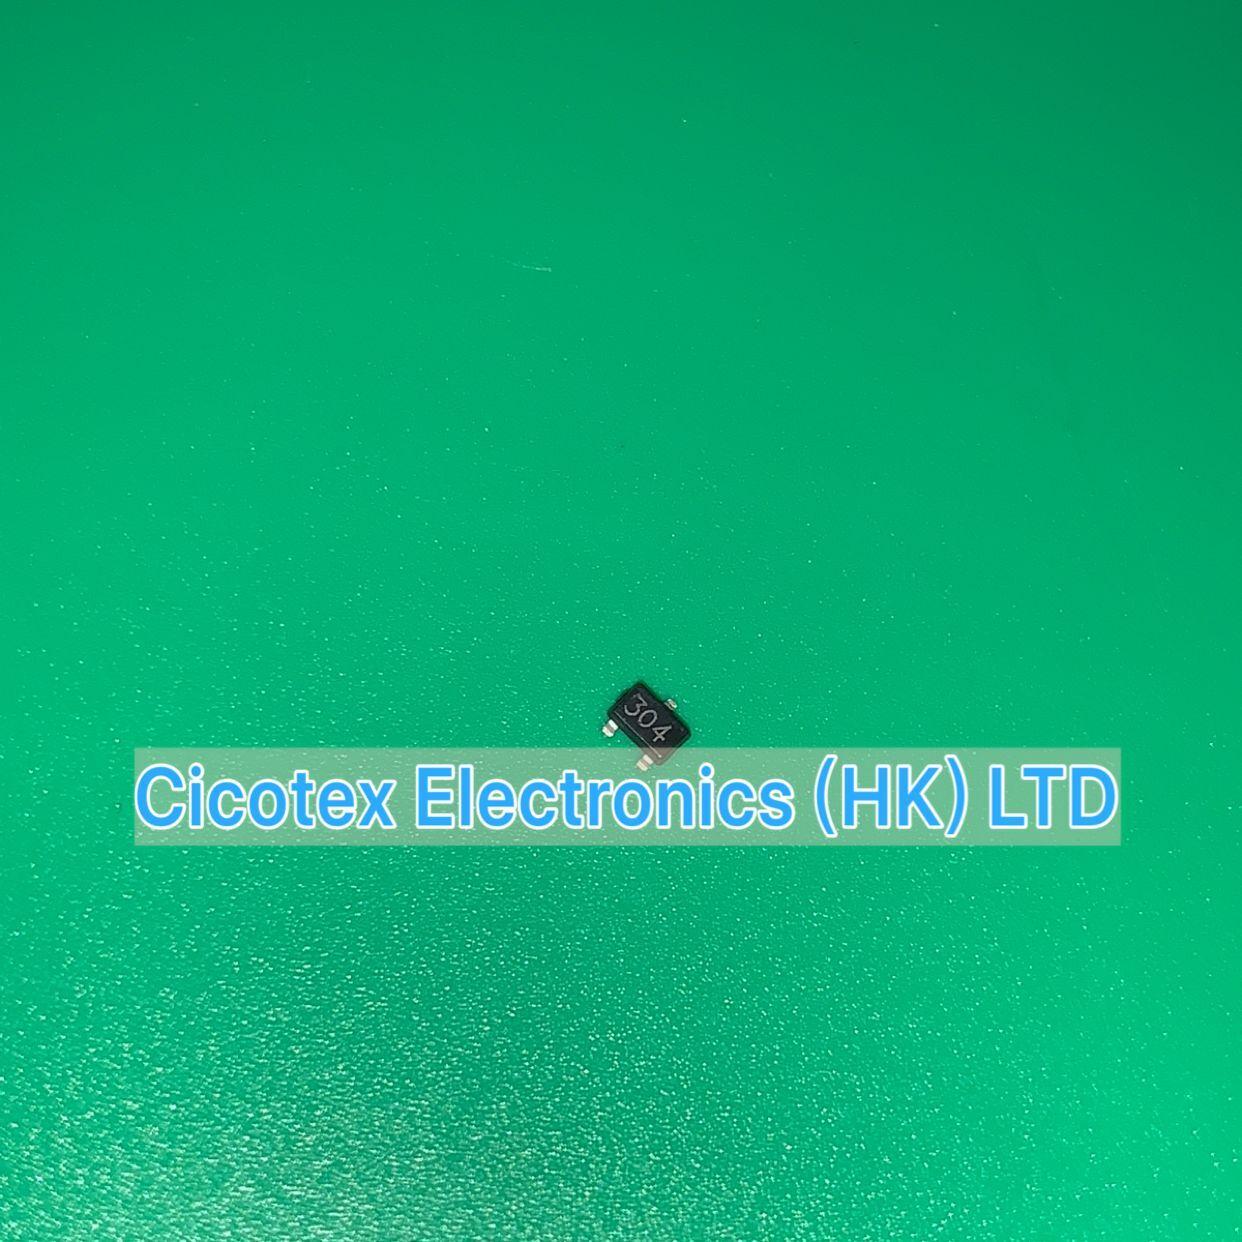 30pcs/lot A1304 ELHLX SOT23-3 A1 304 ELHLX A1304ELHLX SENSOR HALL EFFECT ANALOG SOT23W A1304ELHLX-T